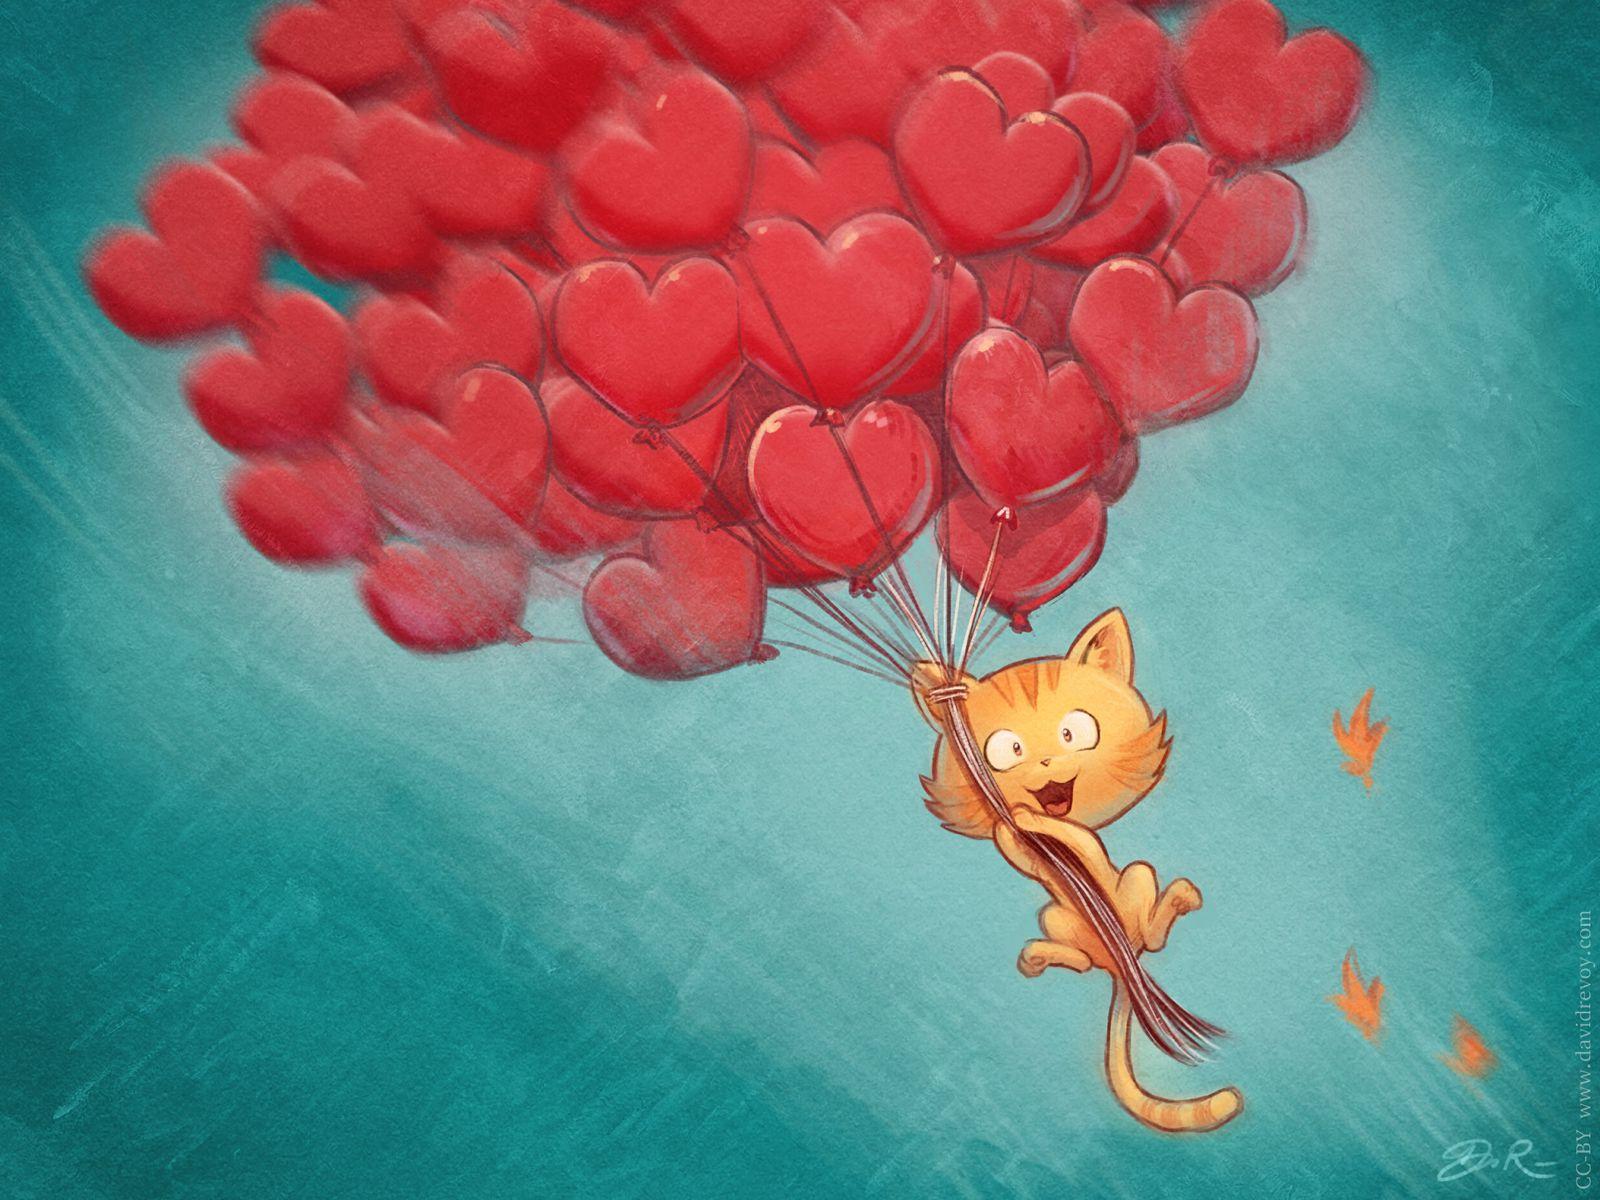 1600x1200 Wallpaper cat, balloons, hearts, flight, sky, art